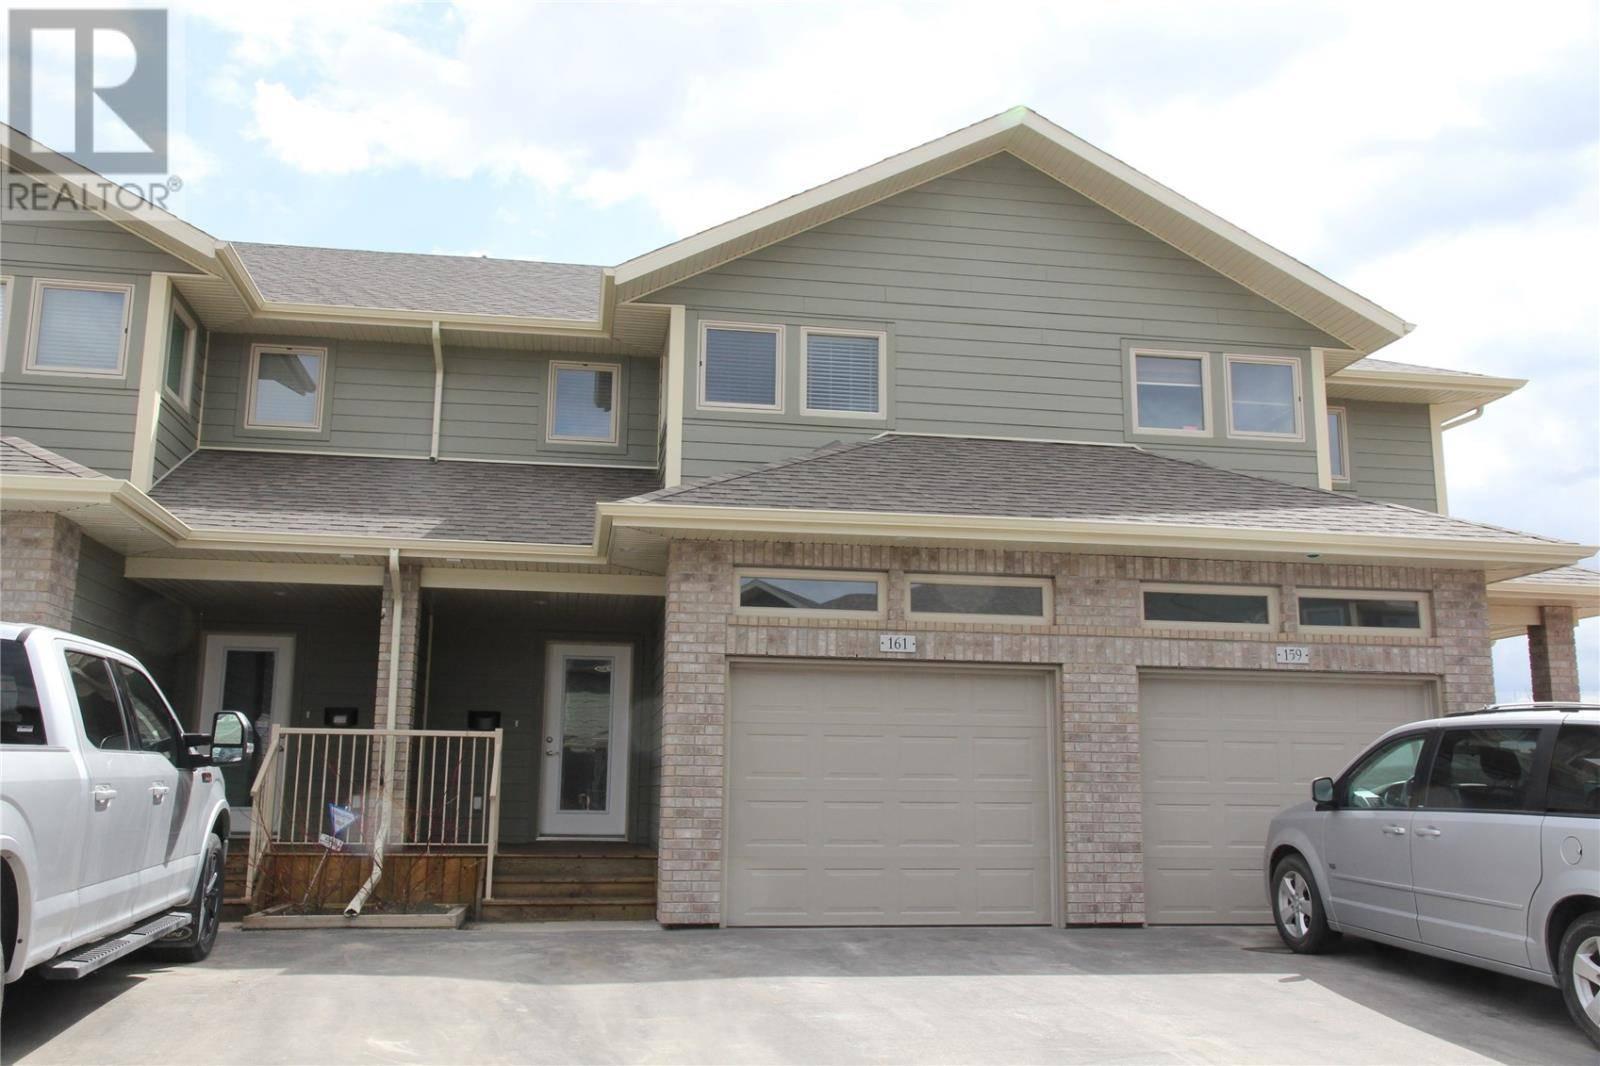 Townhouse for sale at 115 Shepherd Cres Unit 161 Saskatoon Saskatchewan - MLS: SK762554